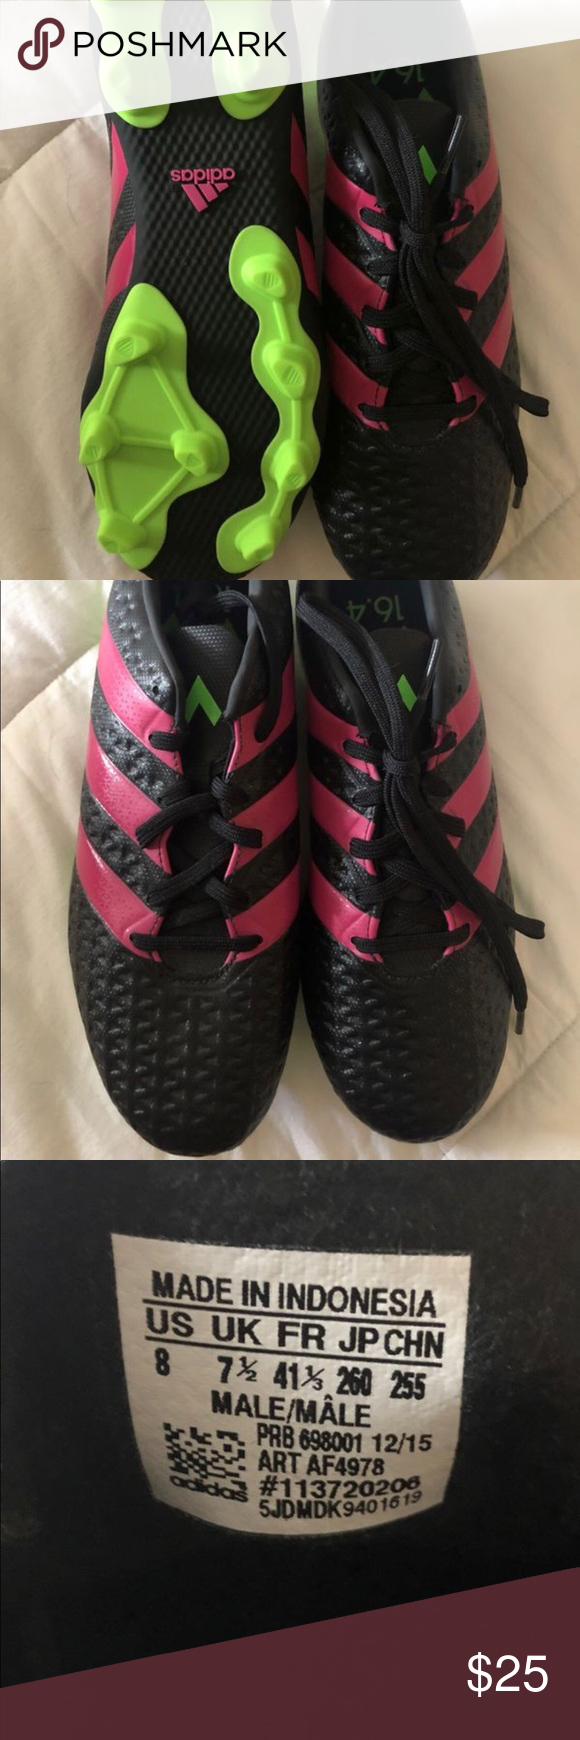 d857eccd781 Adidas Men Soccer Shoes Adidas Ace 16.4 FXG Men s Soccer Cleats Black Pink Green  AF4978 Size 8. No box